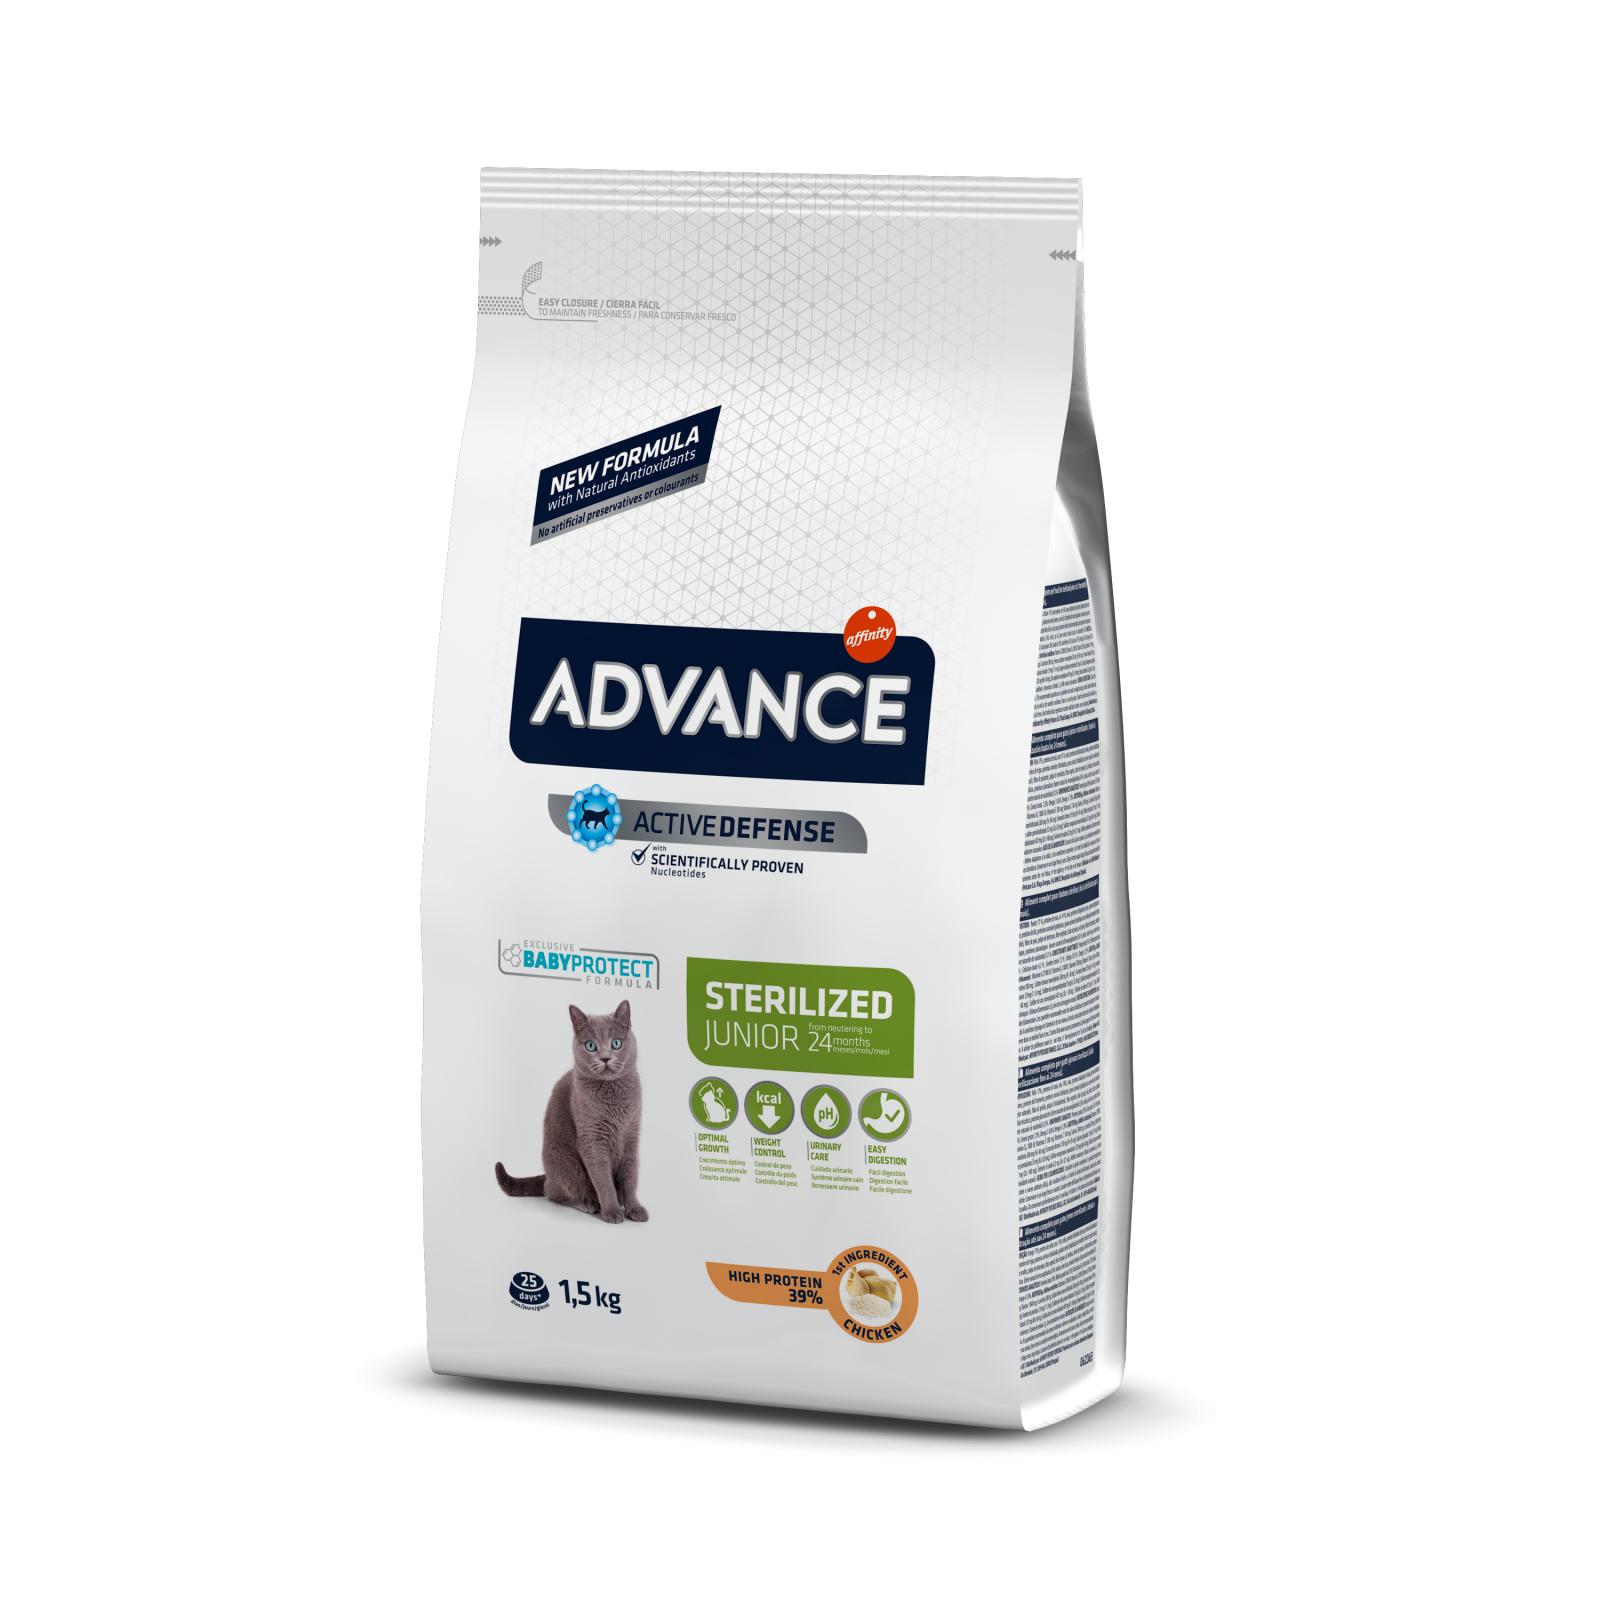 Advance Cat Young Sterilized, 1.5 kg